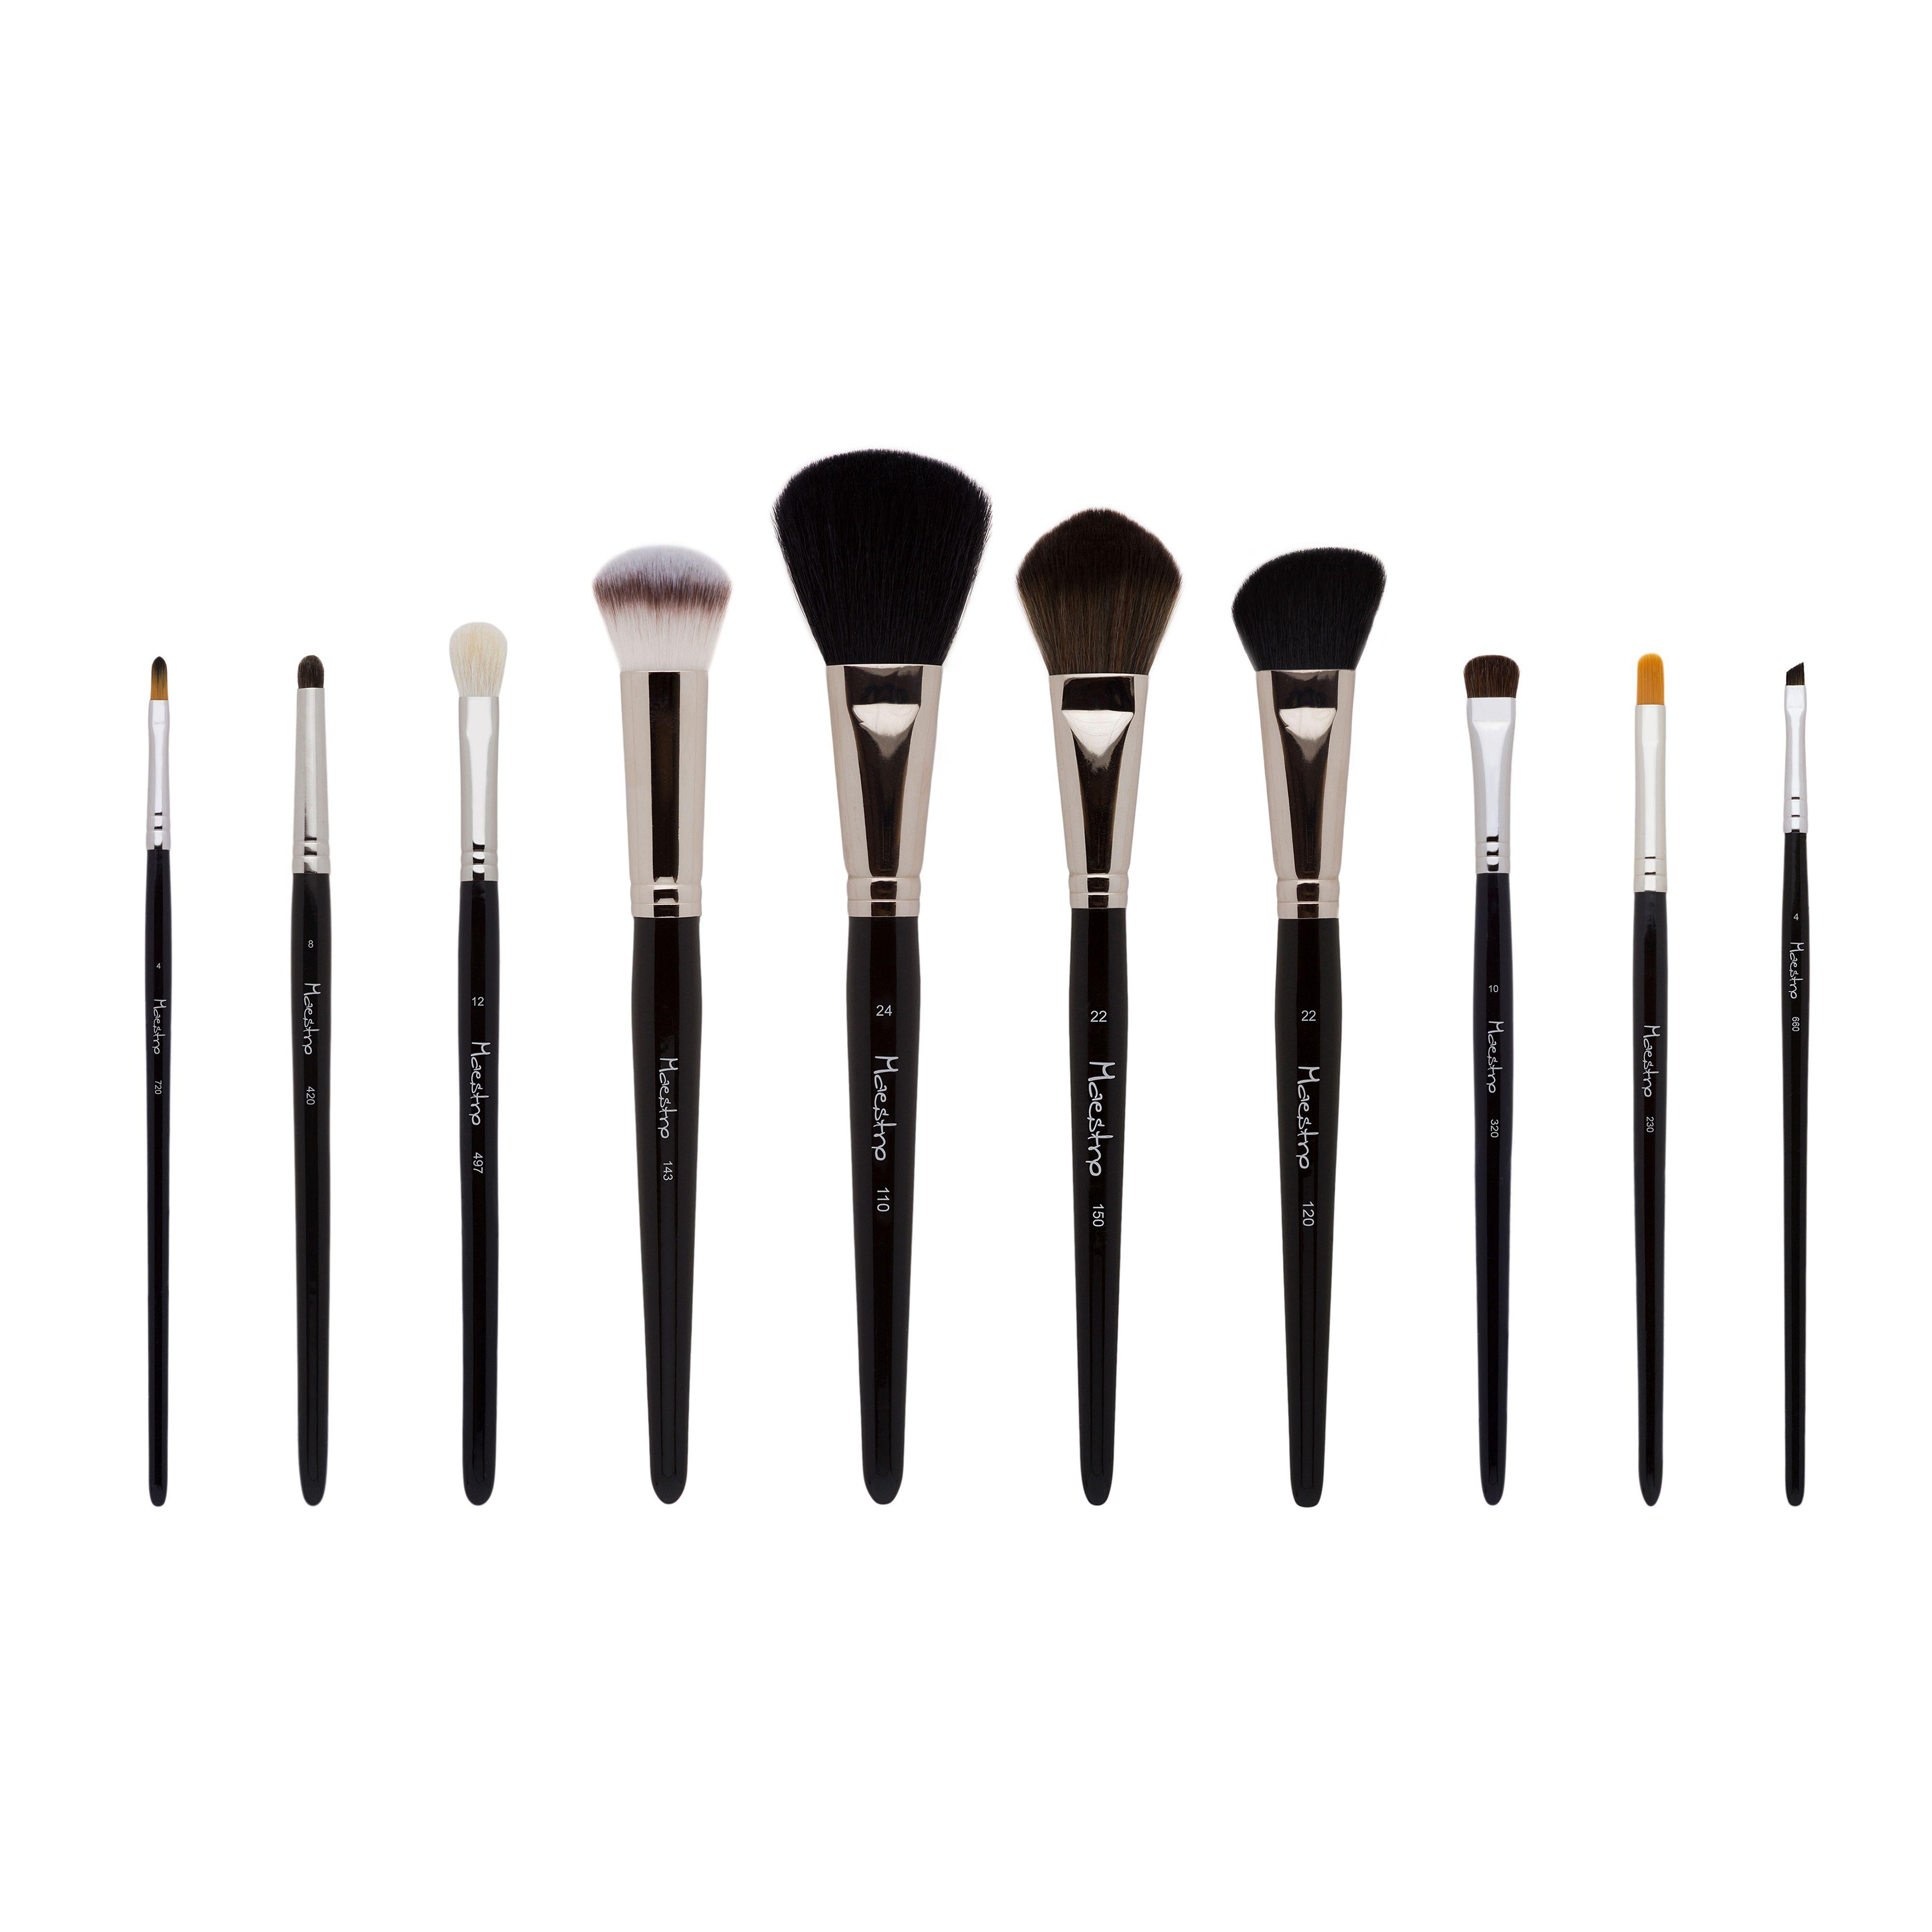 Podstawowy Zestaw Pedzelkow Do Makijazu Makeup Brushes Powder Brush Brush